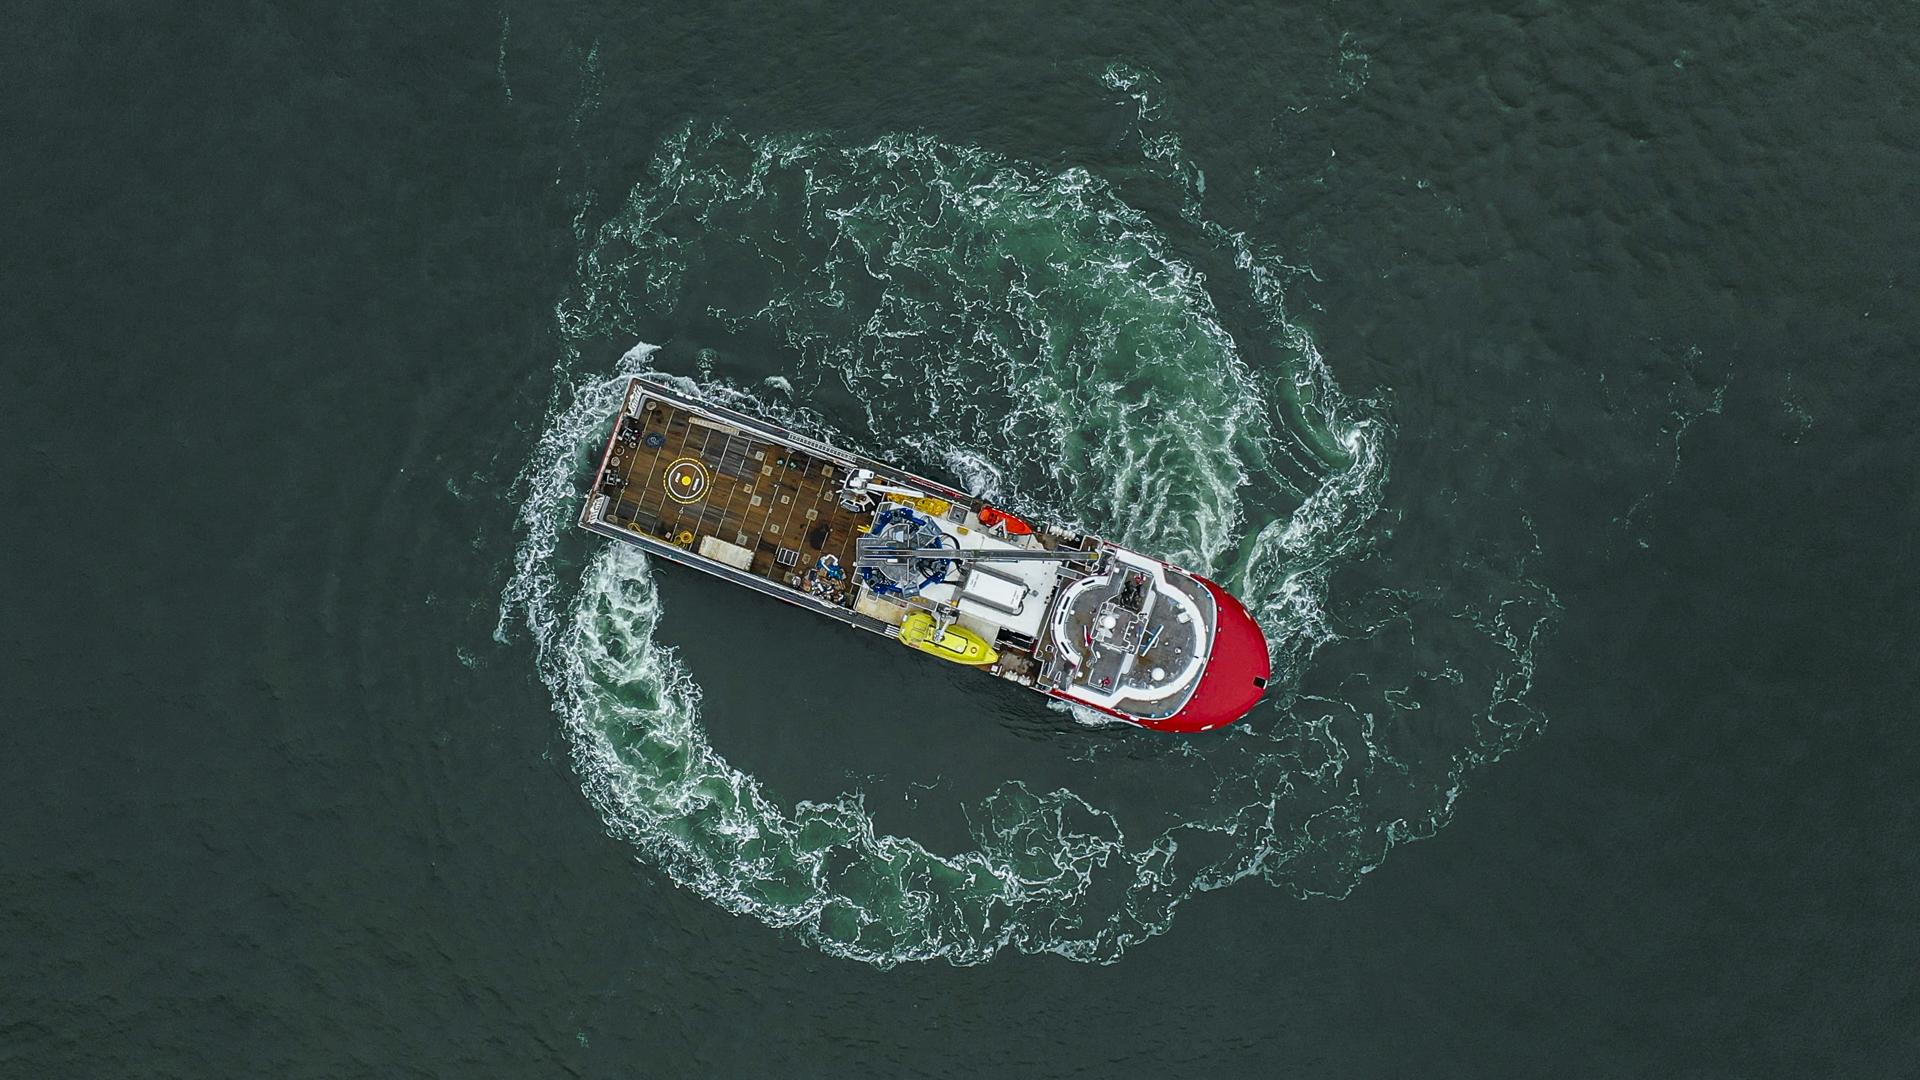 Third 'walk-to-work' vessel into service as 'Keizersborg'